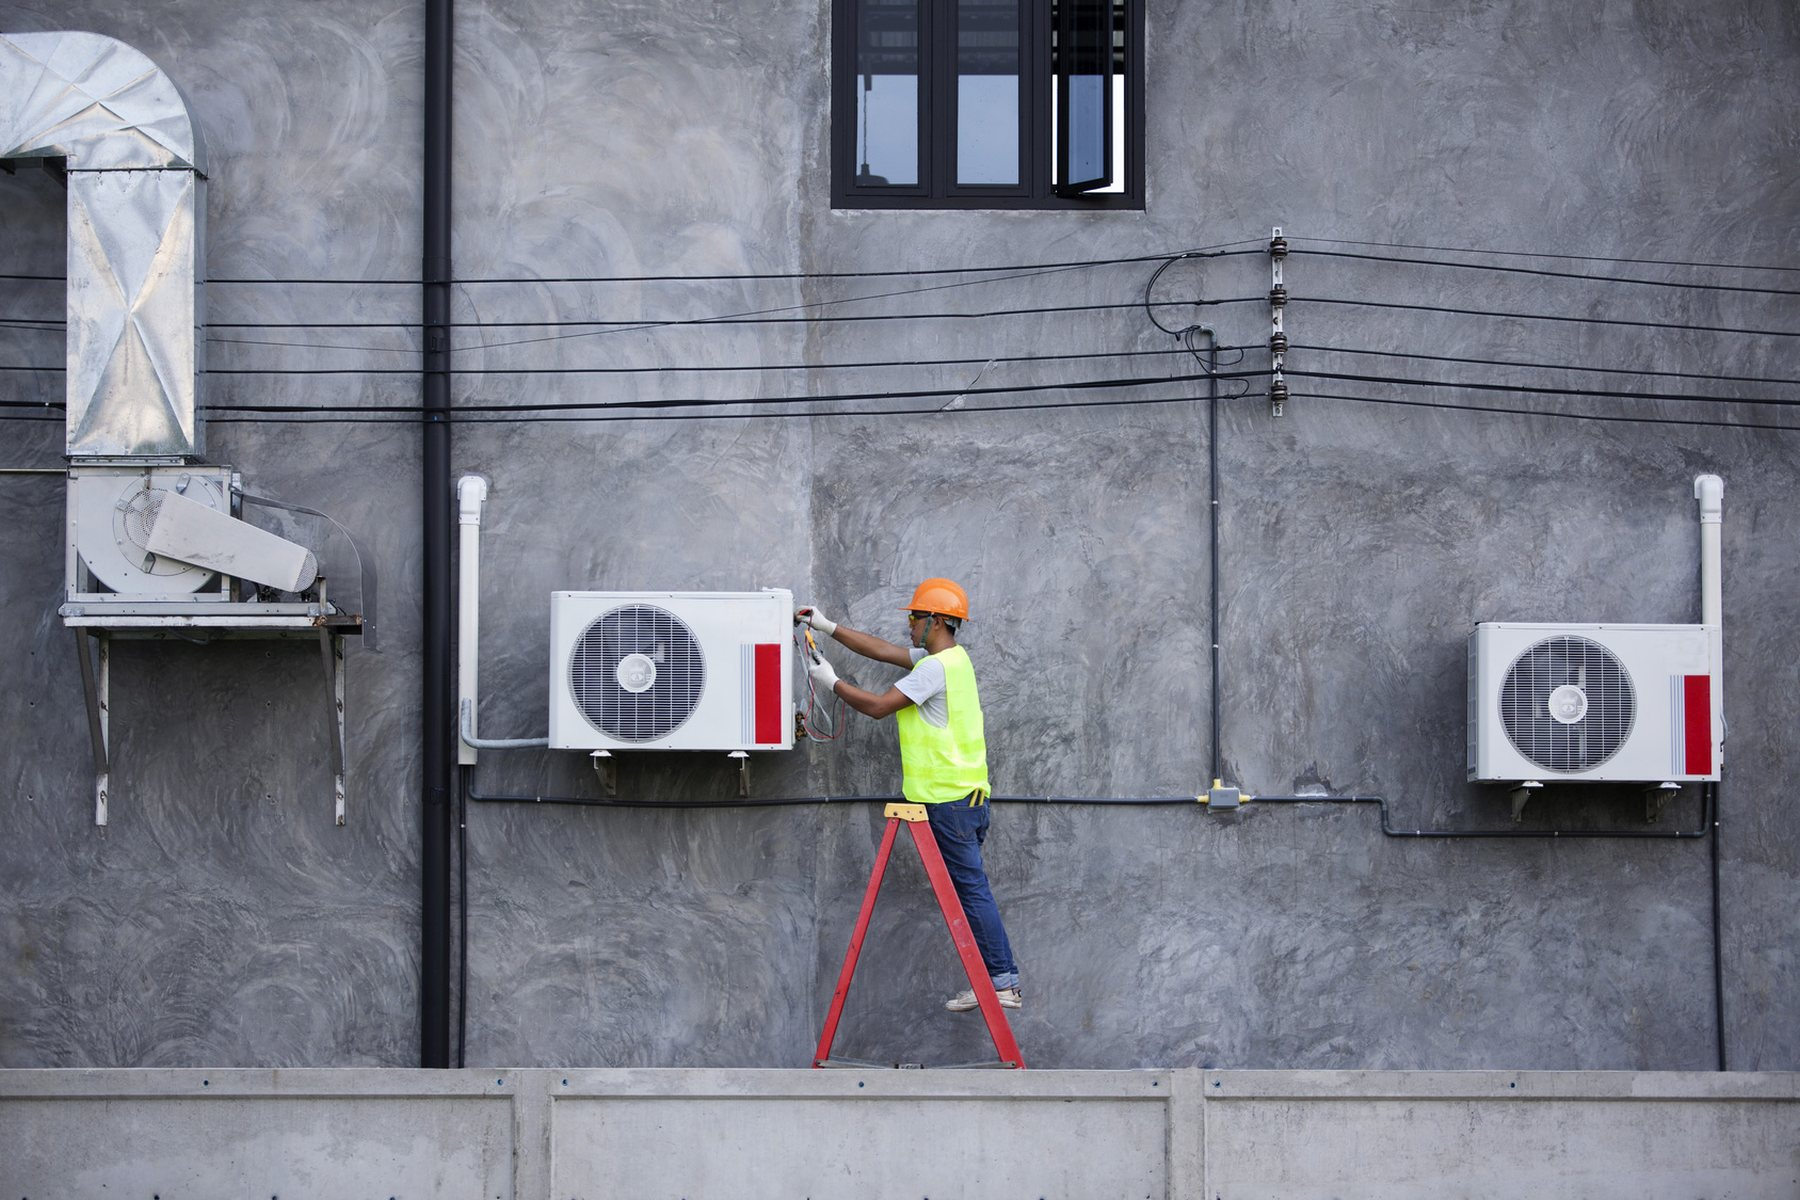 Gebäudetechnik Neubau Umbau Sanierung Sanitär Heizung Klimatechnik Halle Leipzig